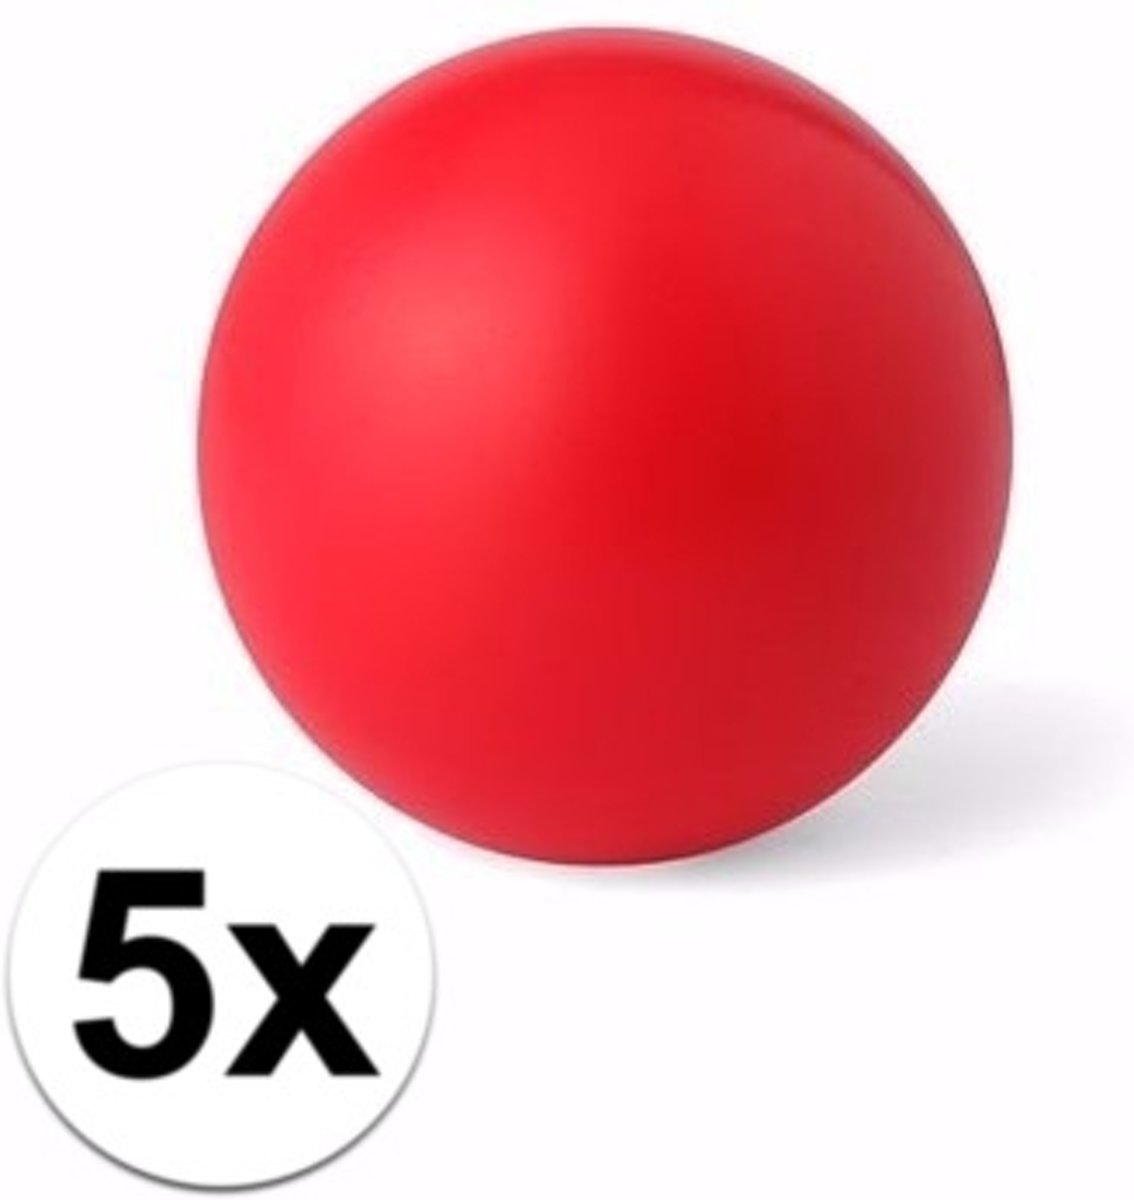 5 rode anti stressballetjes 6 cm - stressbal kopen